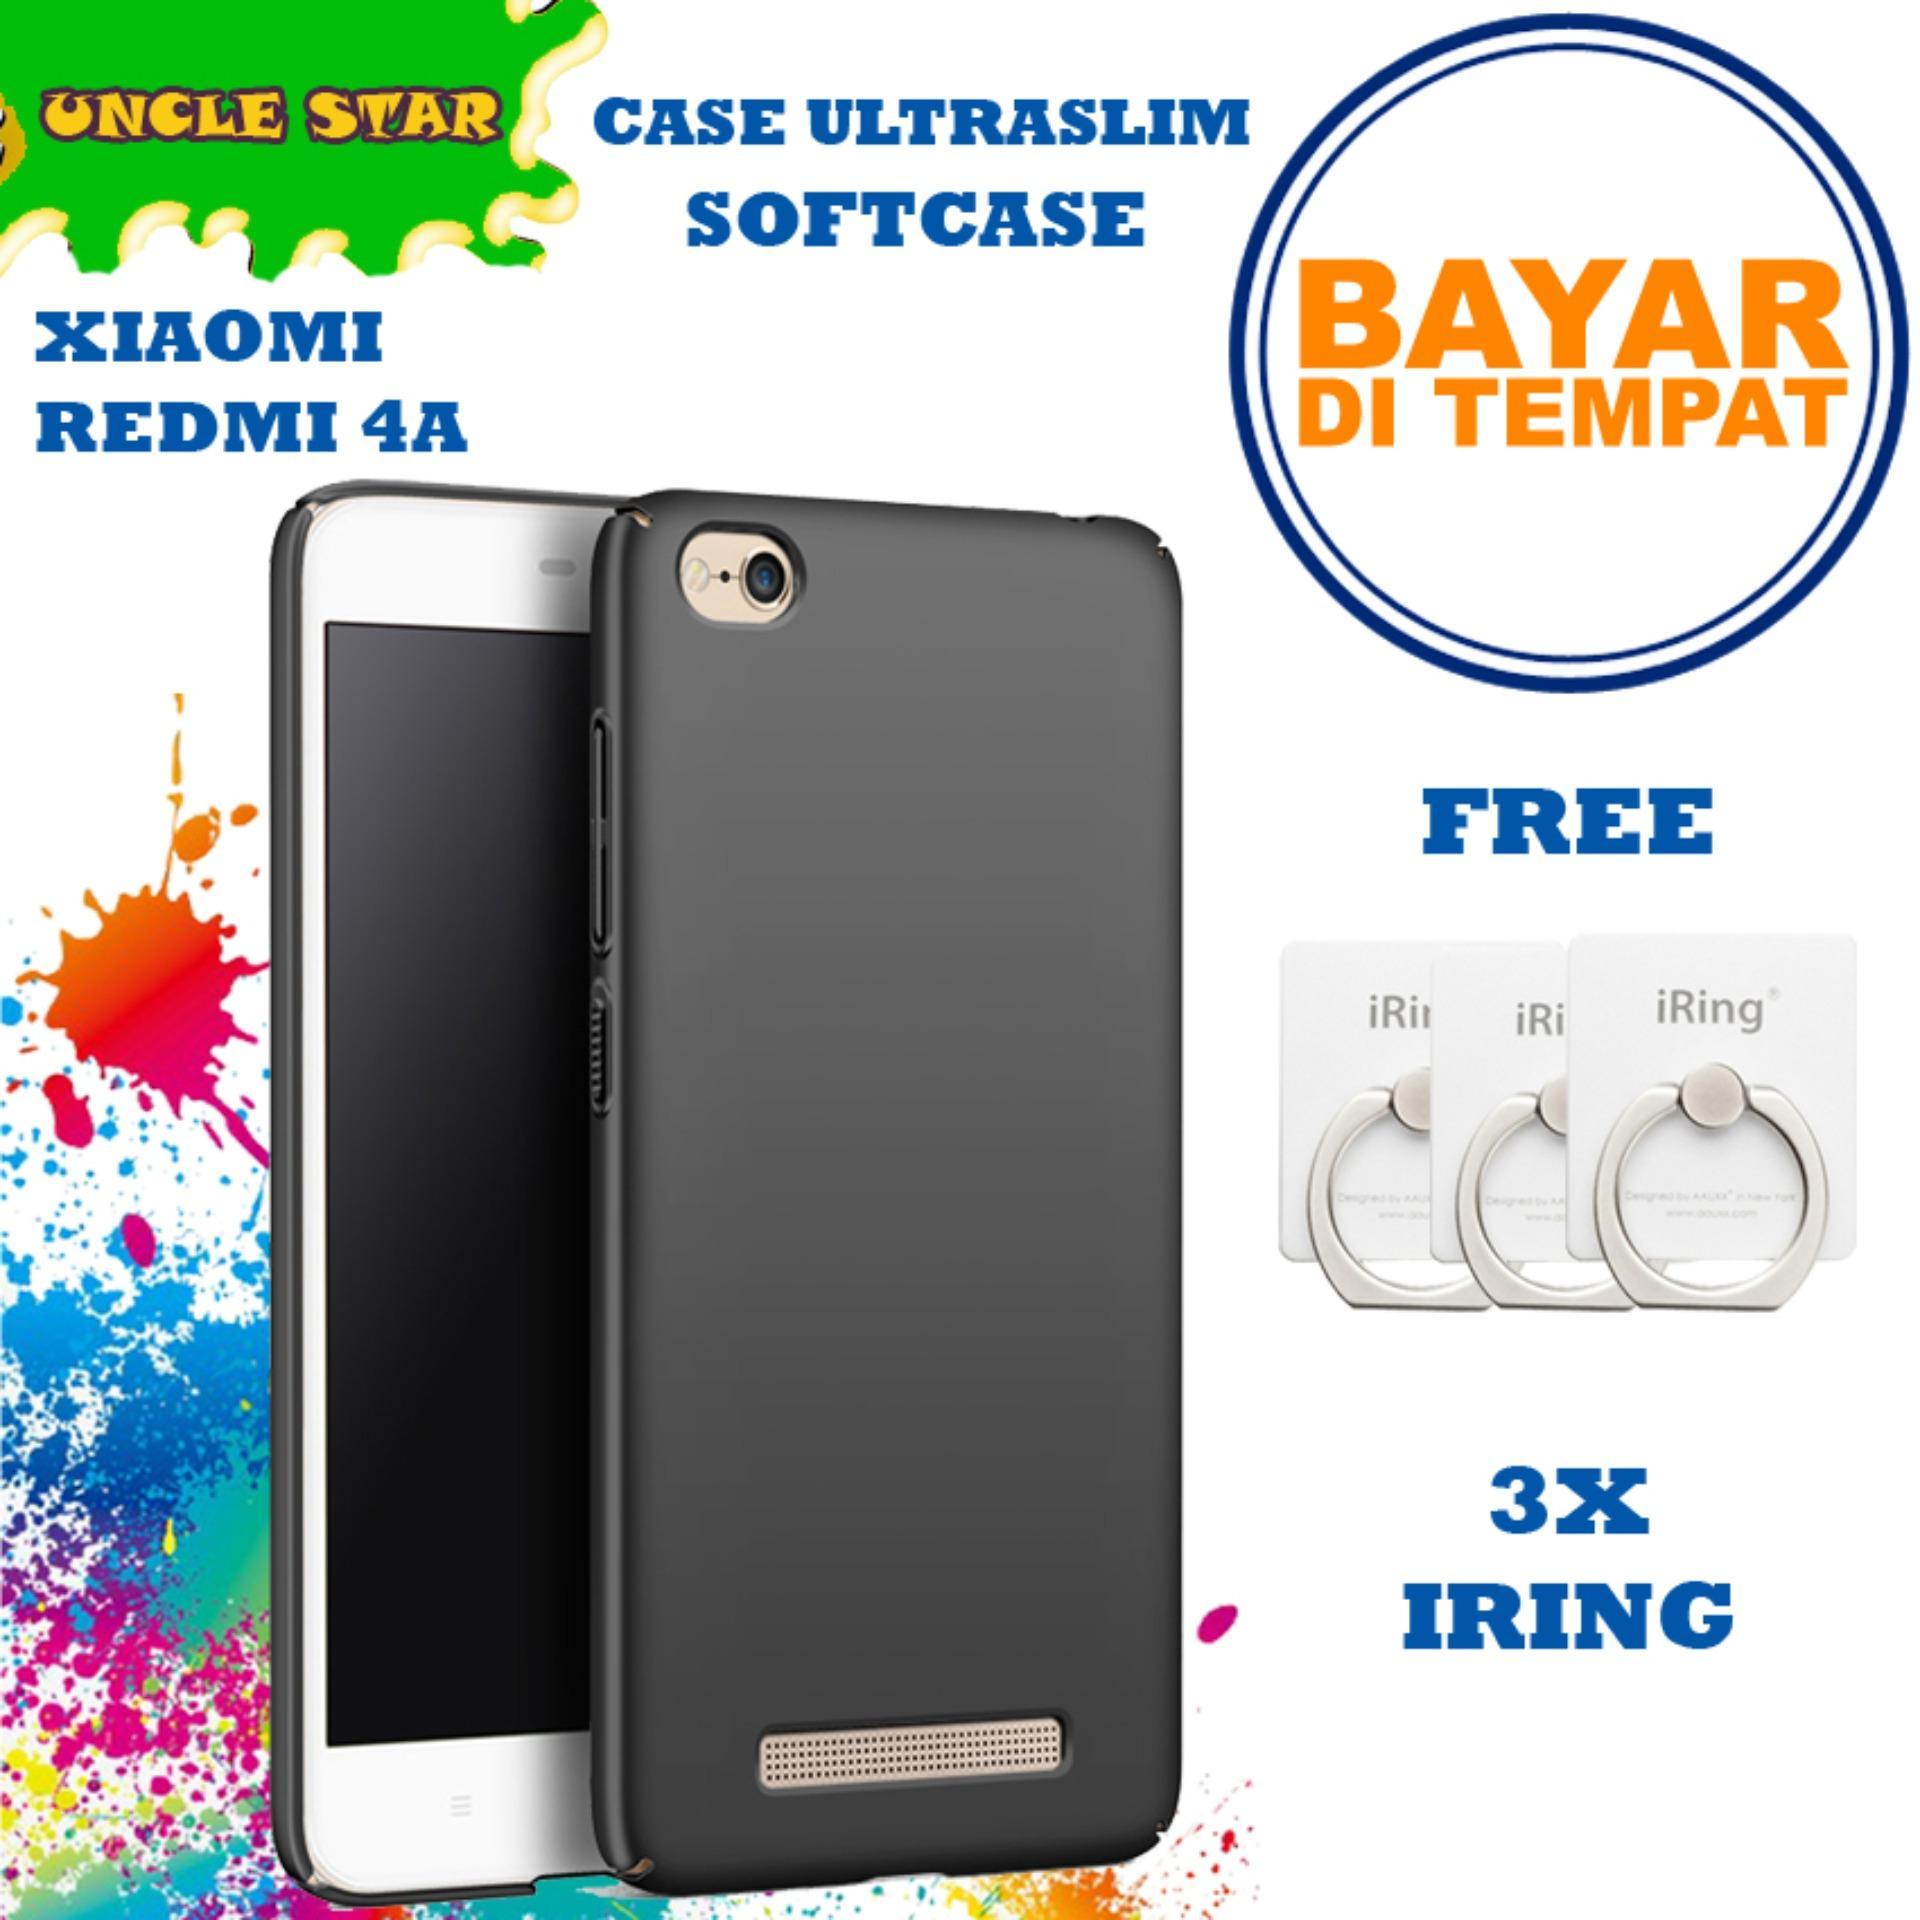 Uncle Star - Case Xiaomi Redmi 4a Softcase Xiaomi Ultrslim Black Matte Baby Skin Anti Minyak